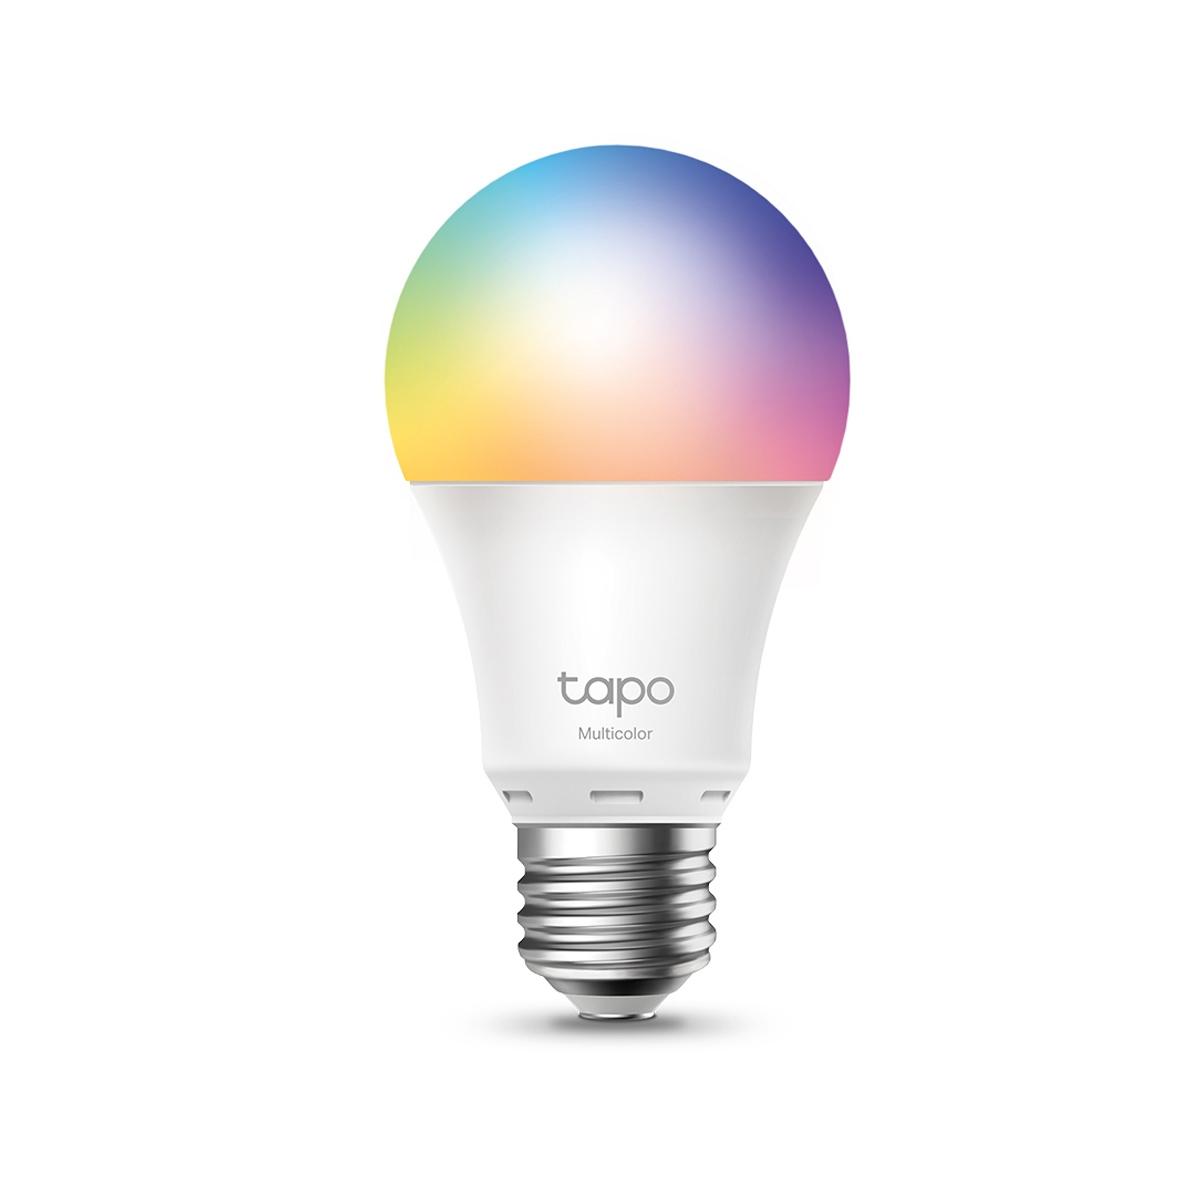 TP-Link Tapo L530E Smart Wi-Fi Light Bulb, Multicolor